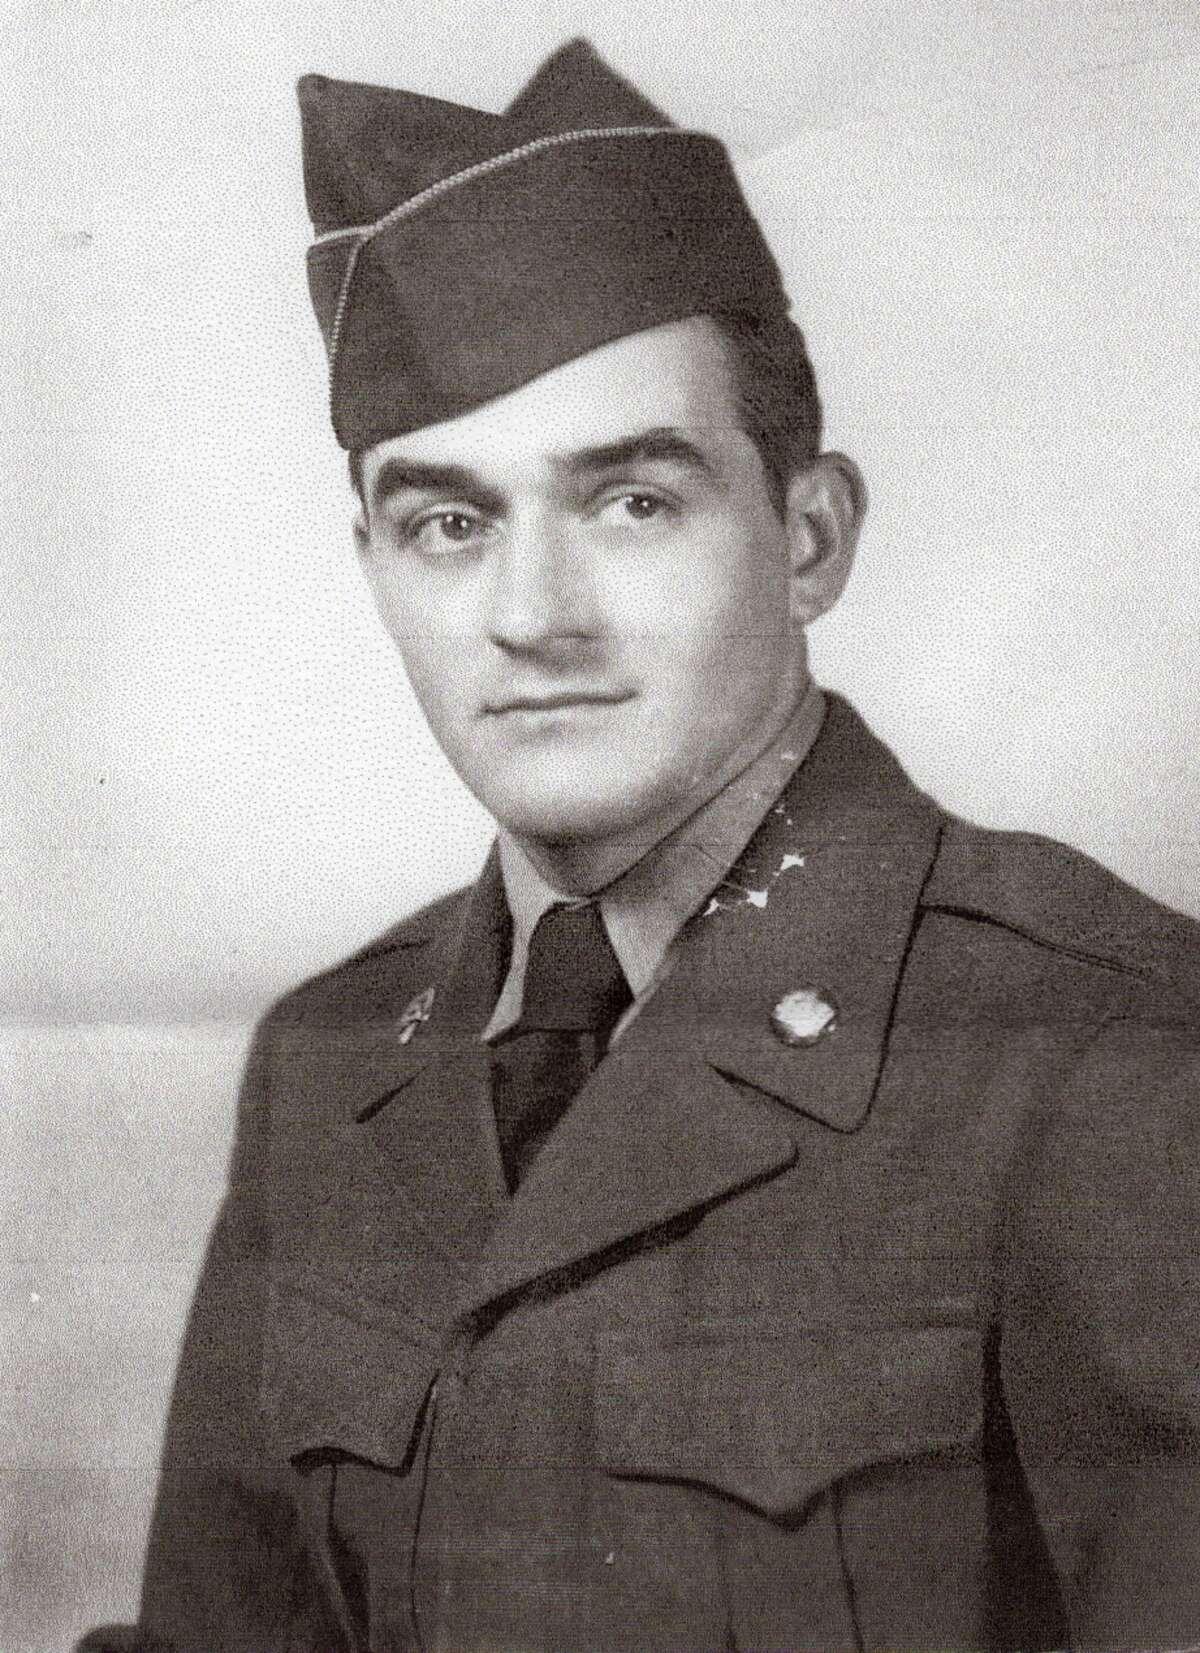 Charles Emmons, CPL (T), U.S. Army